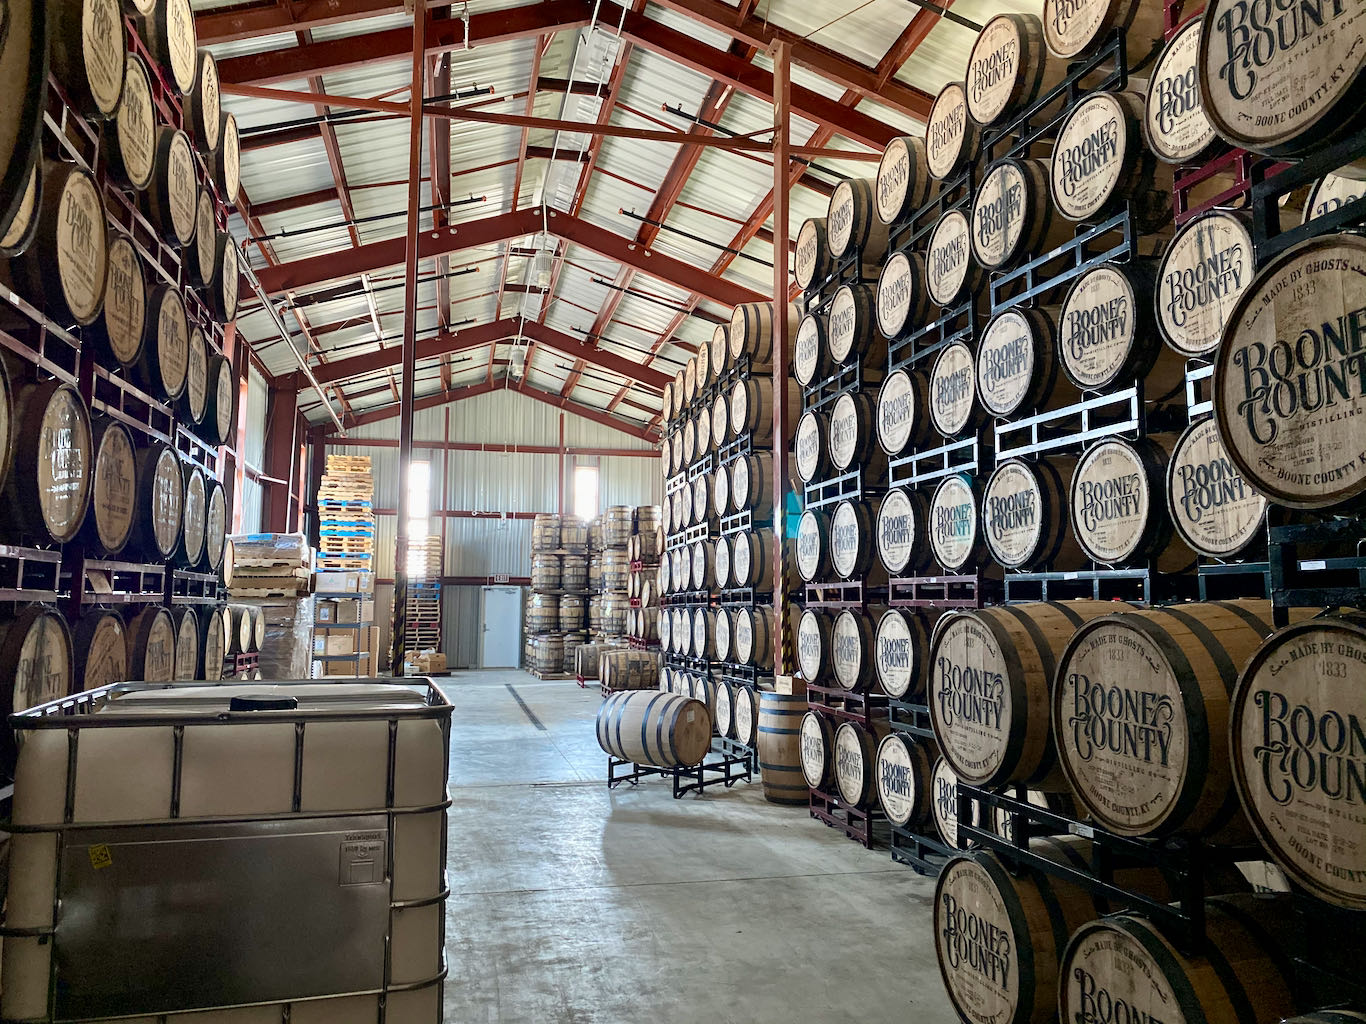 Rickhouse -Boone County Distilling Company